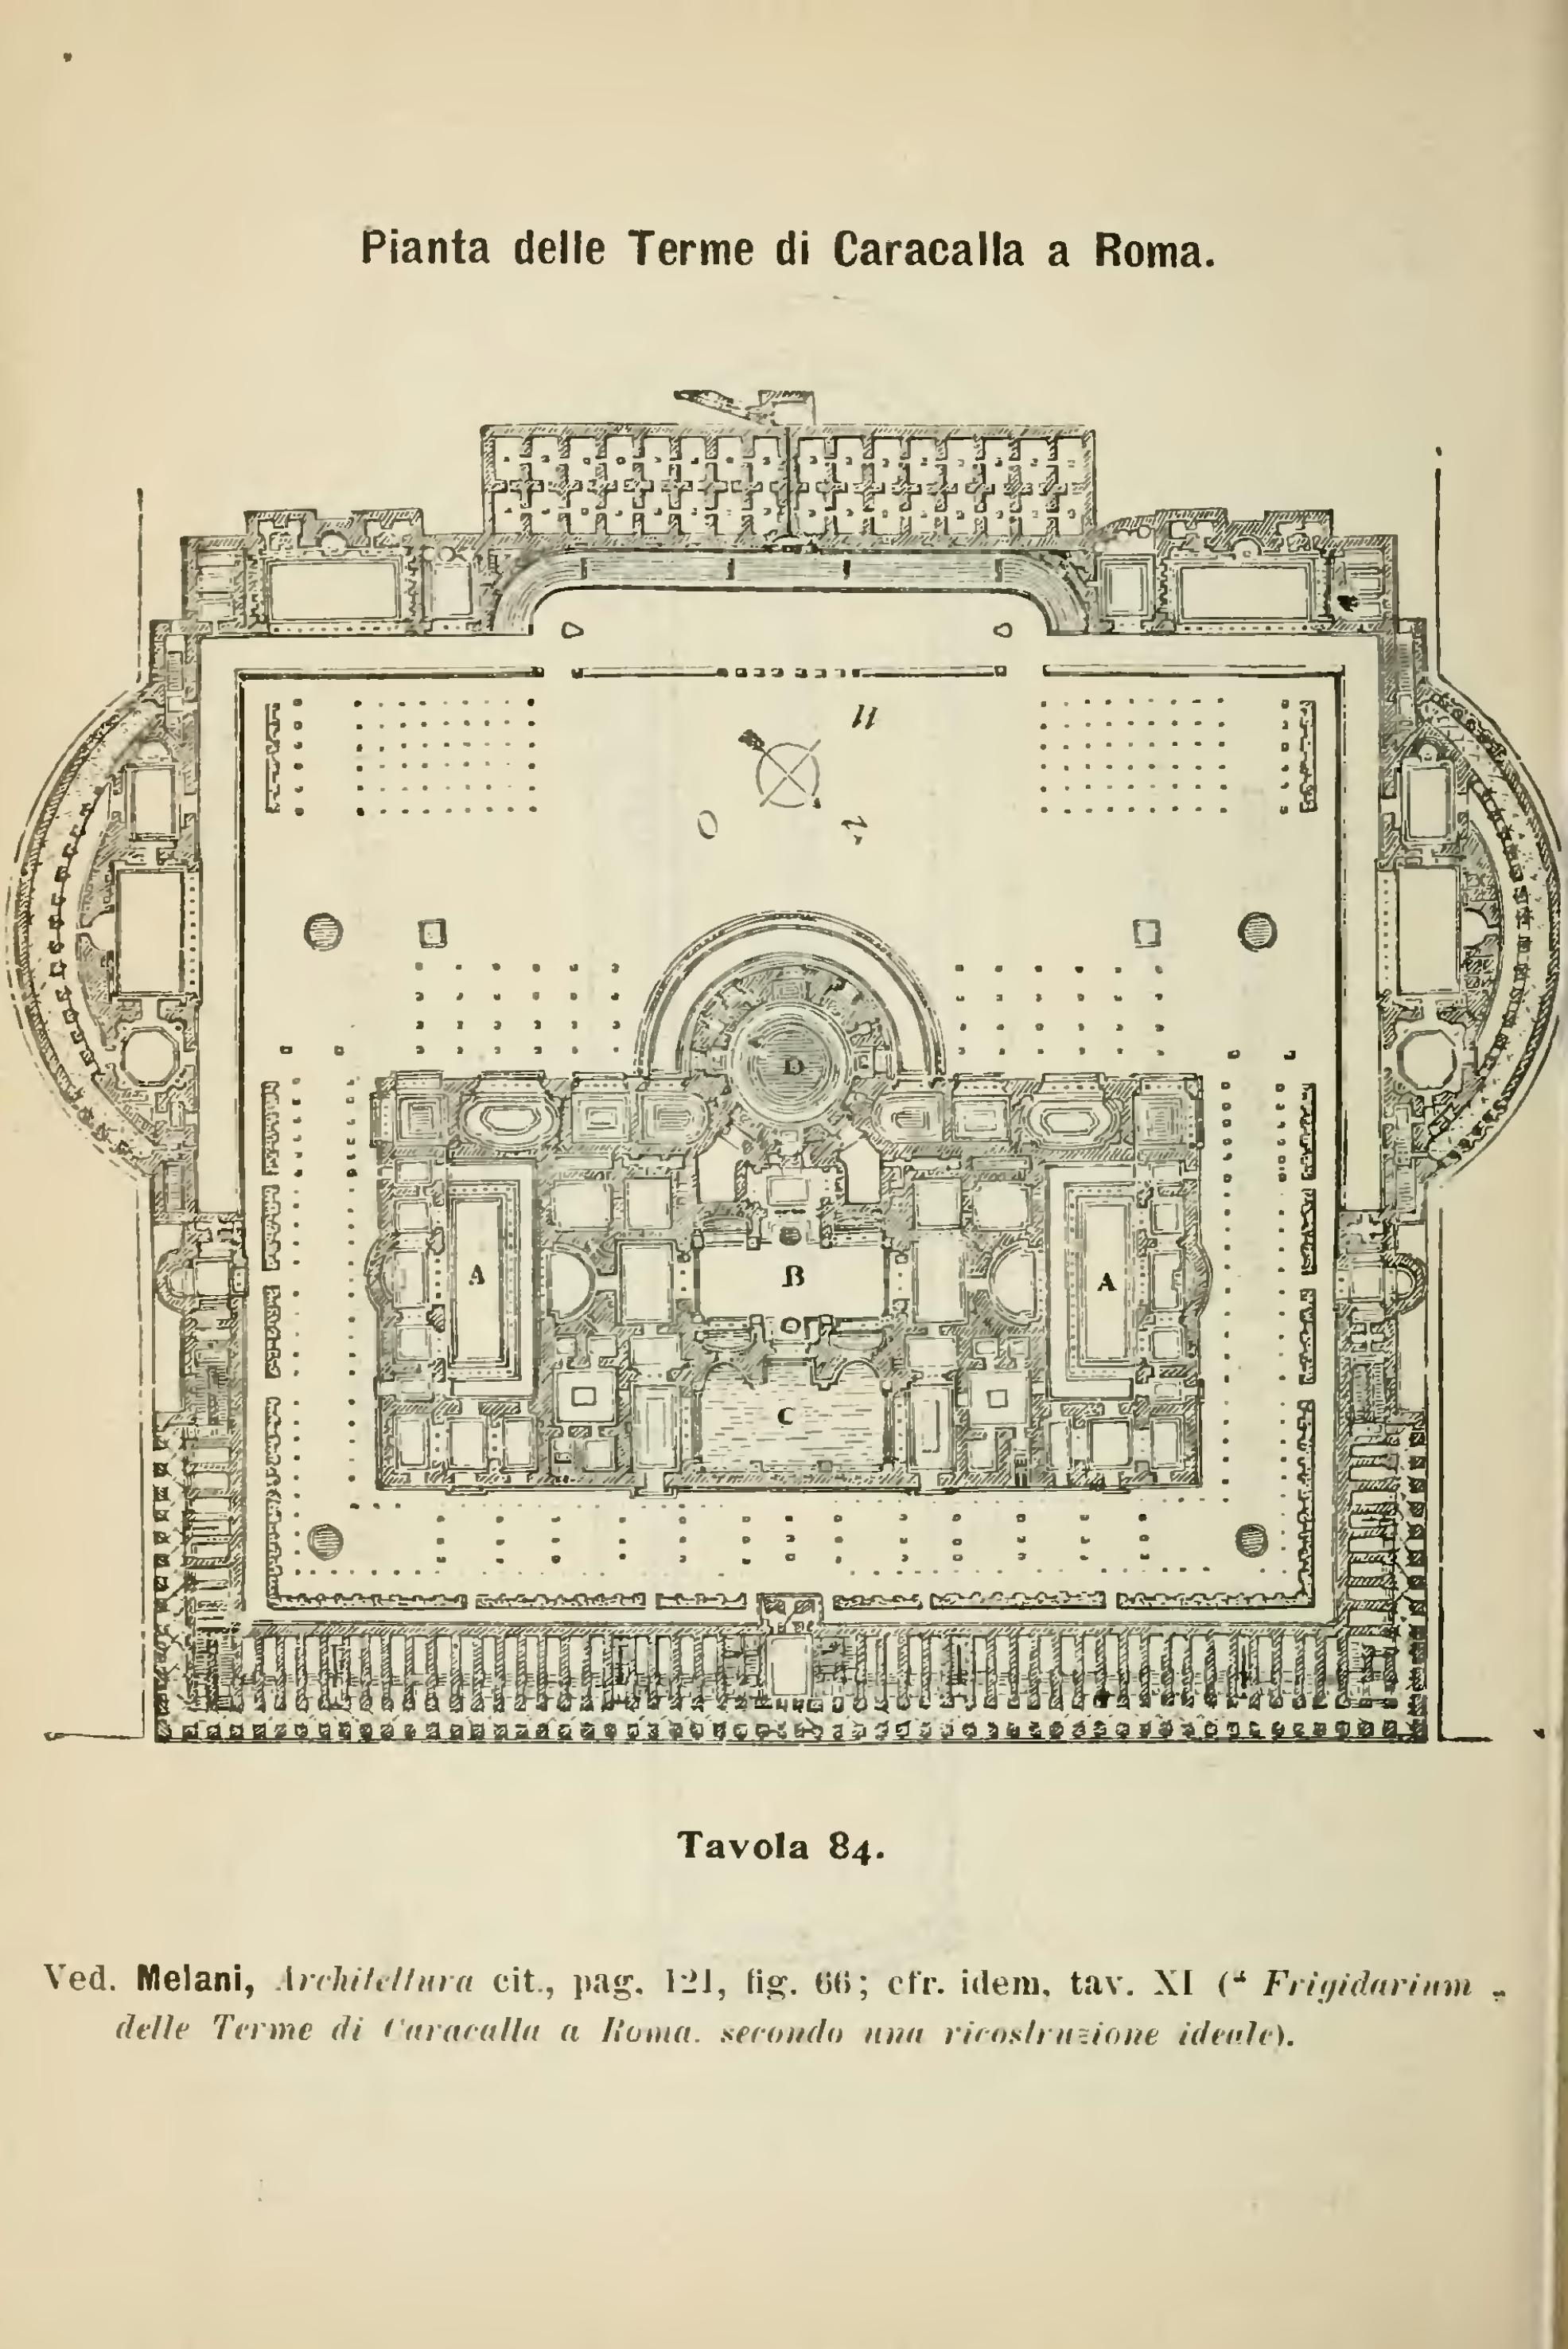 paginatrattato di archeologia gentiledjvu398 wikisource